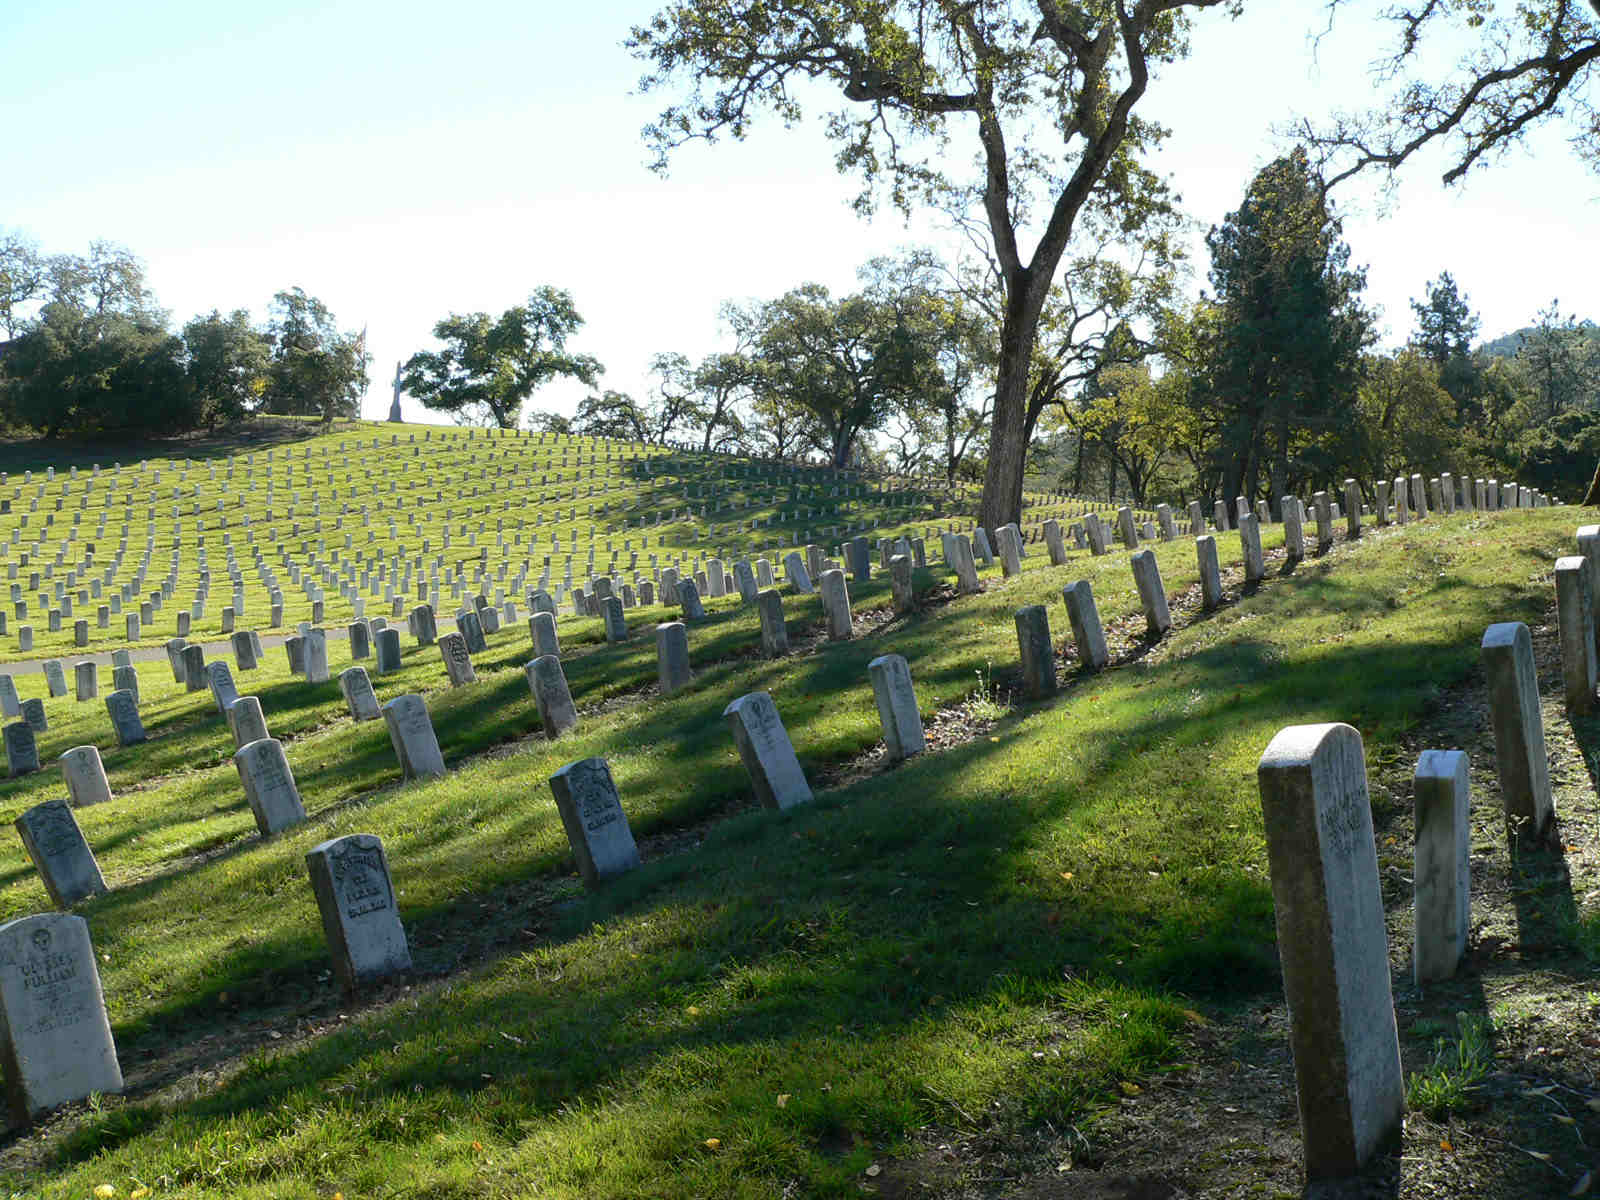 Veterans Memorial Grove Cemetery